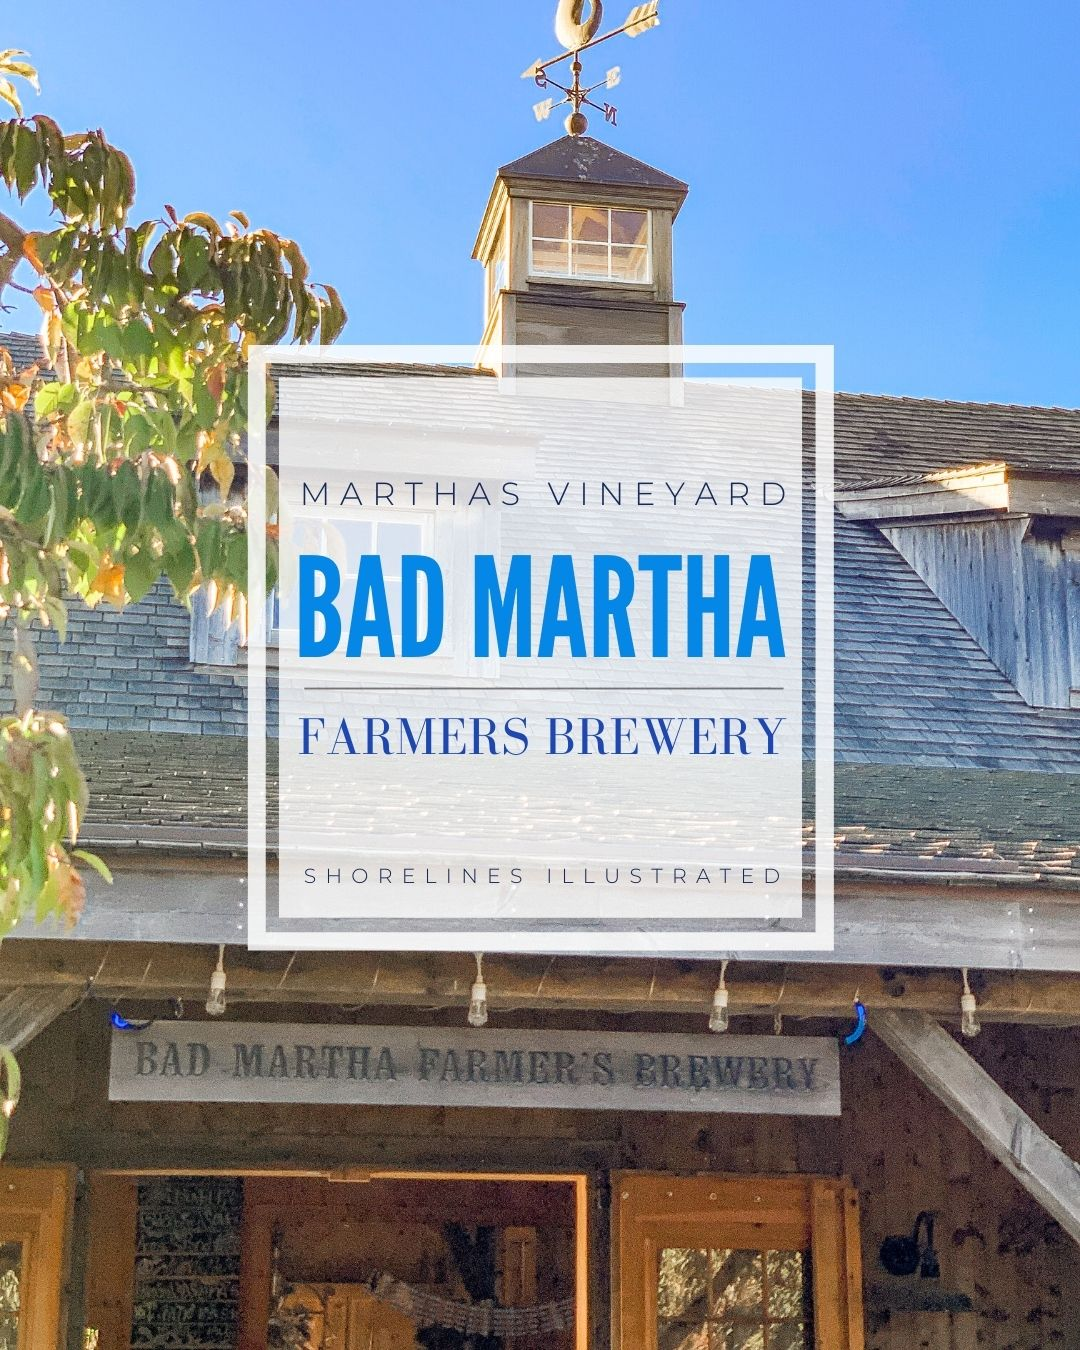 Bad Martha Farmers Brewery Edgartown-1